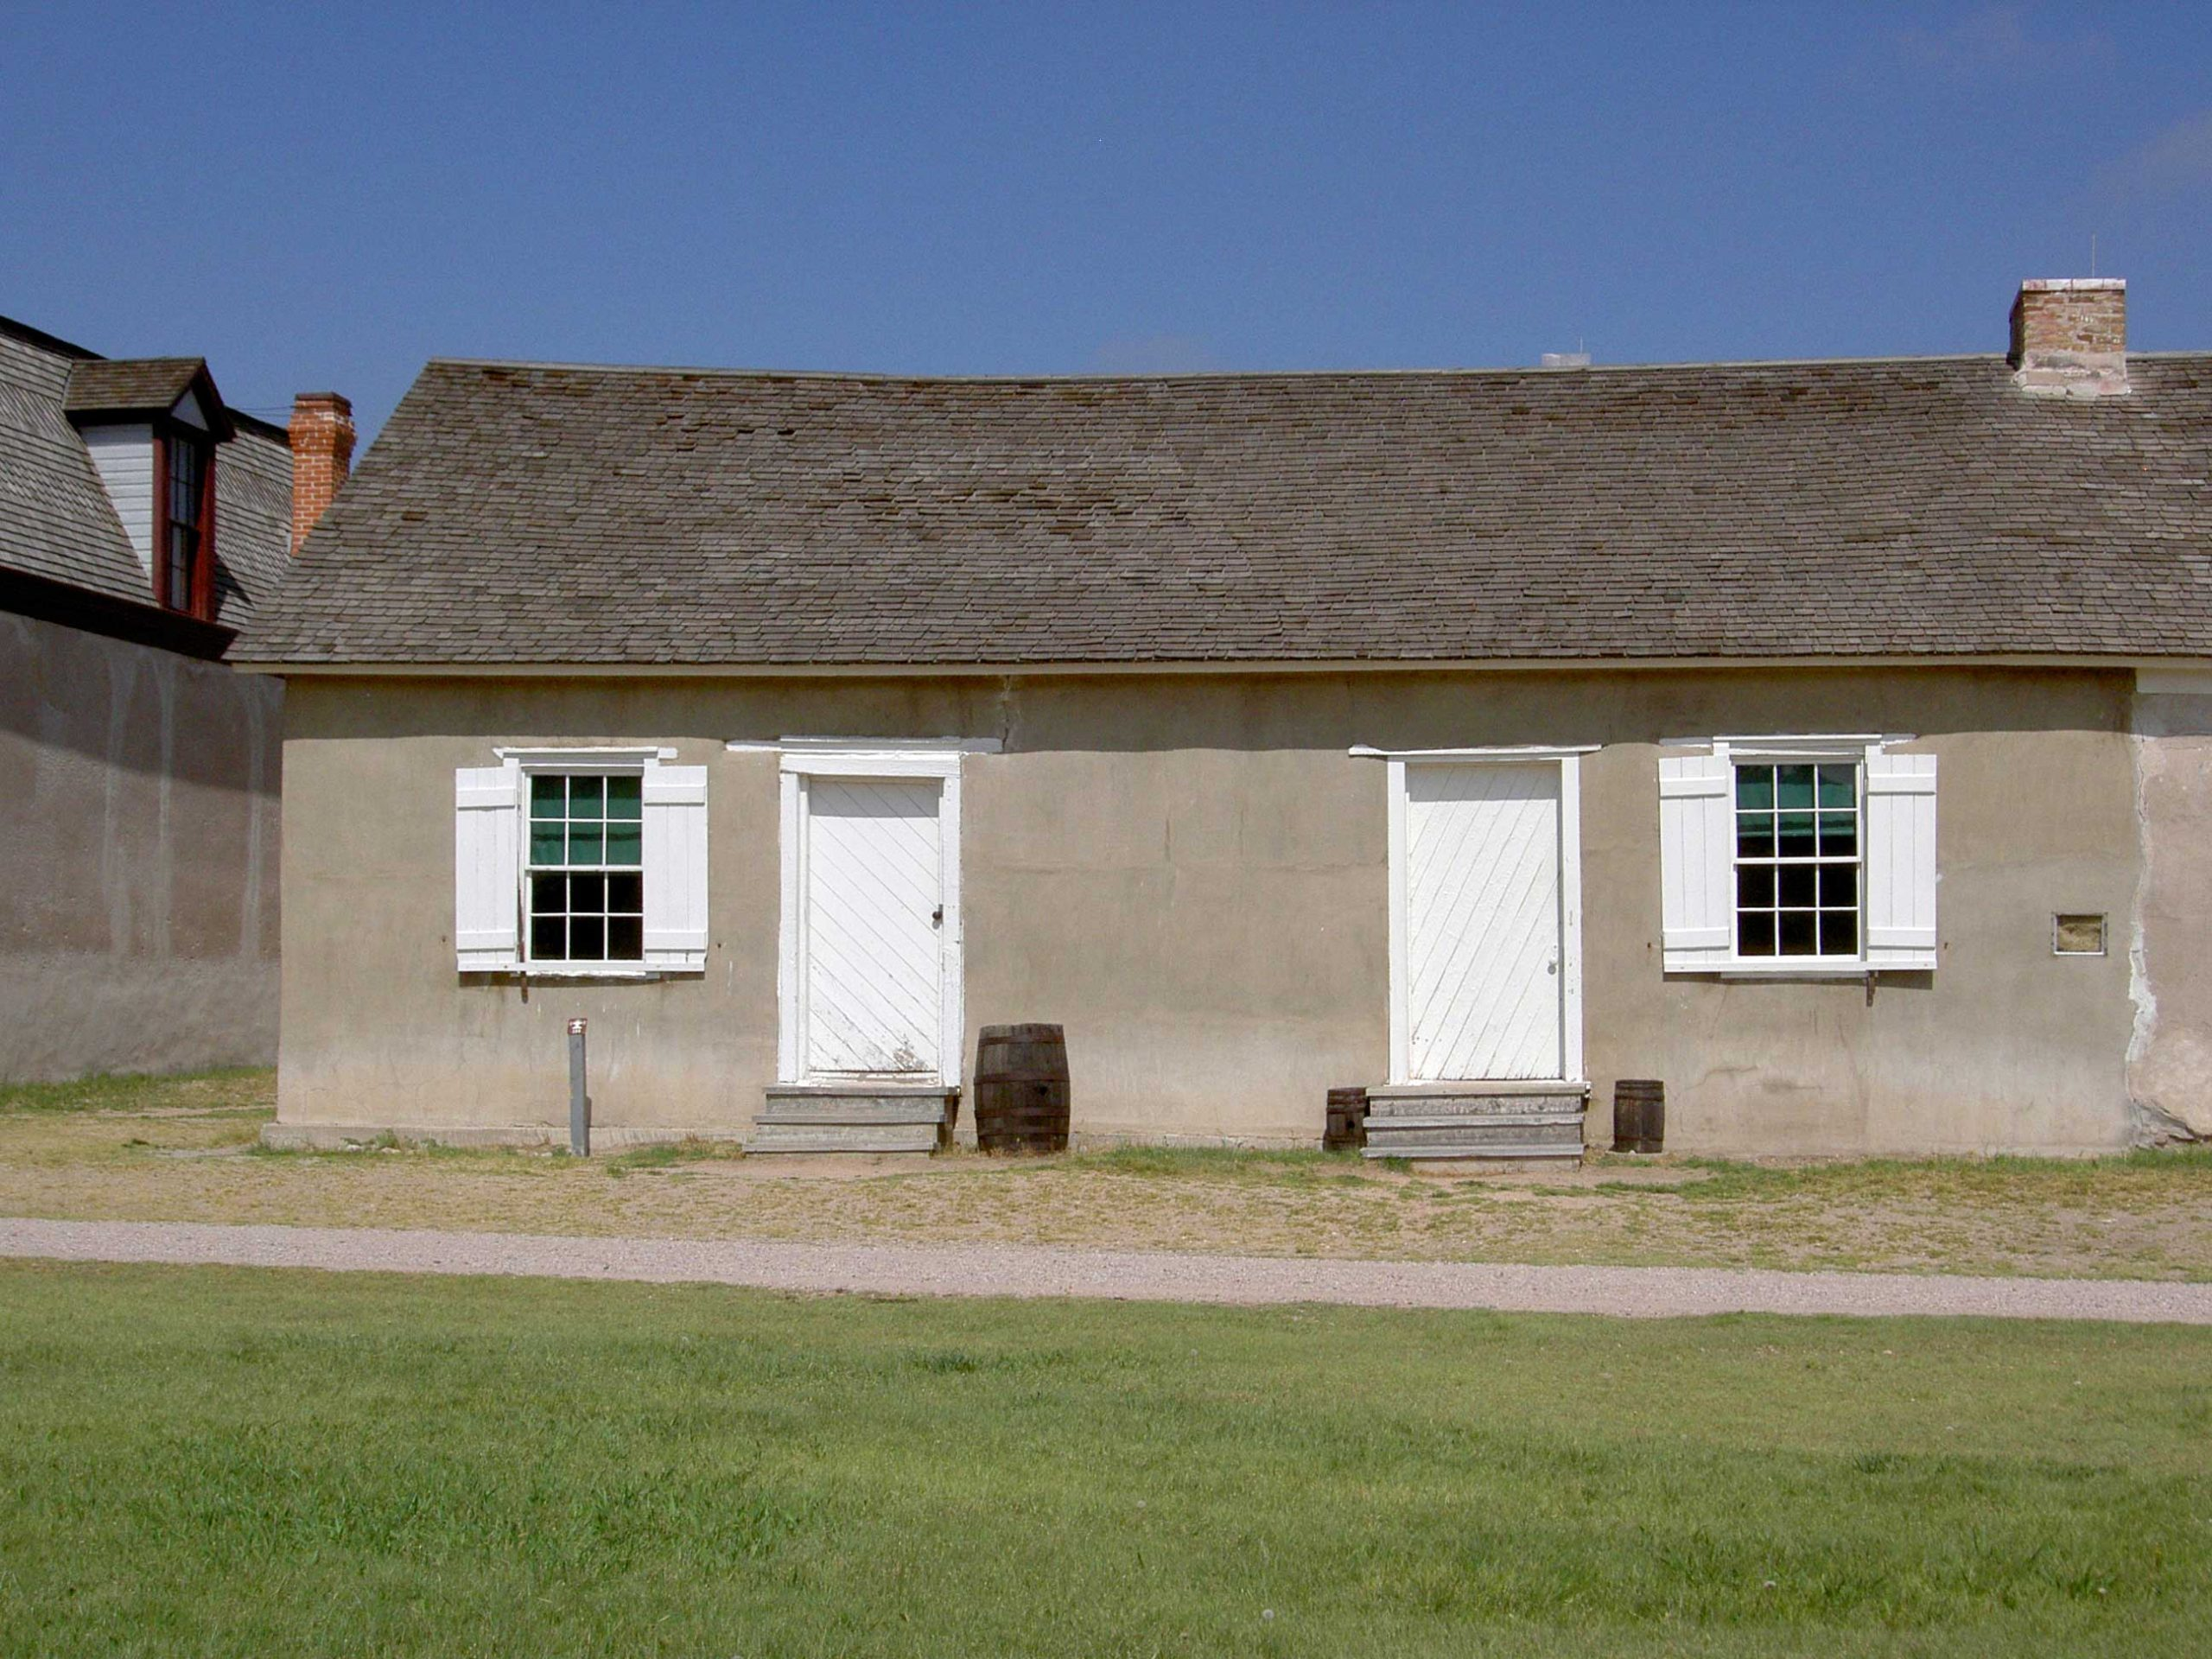 The Sutler's Store, Ft. Laramie in Wyoming